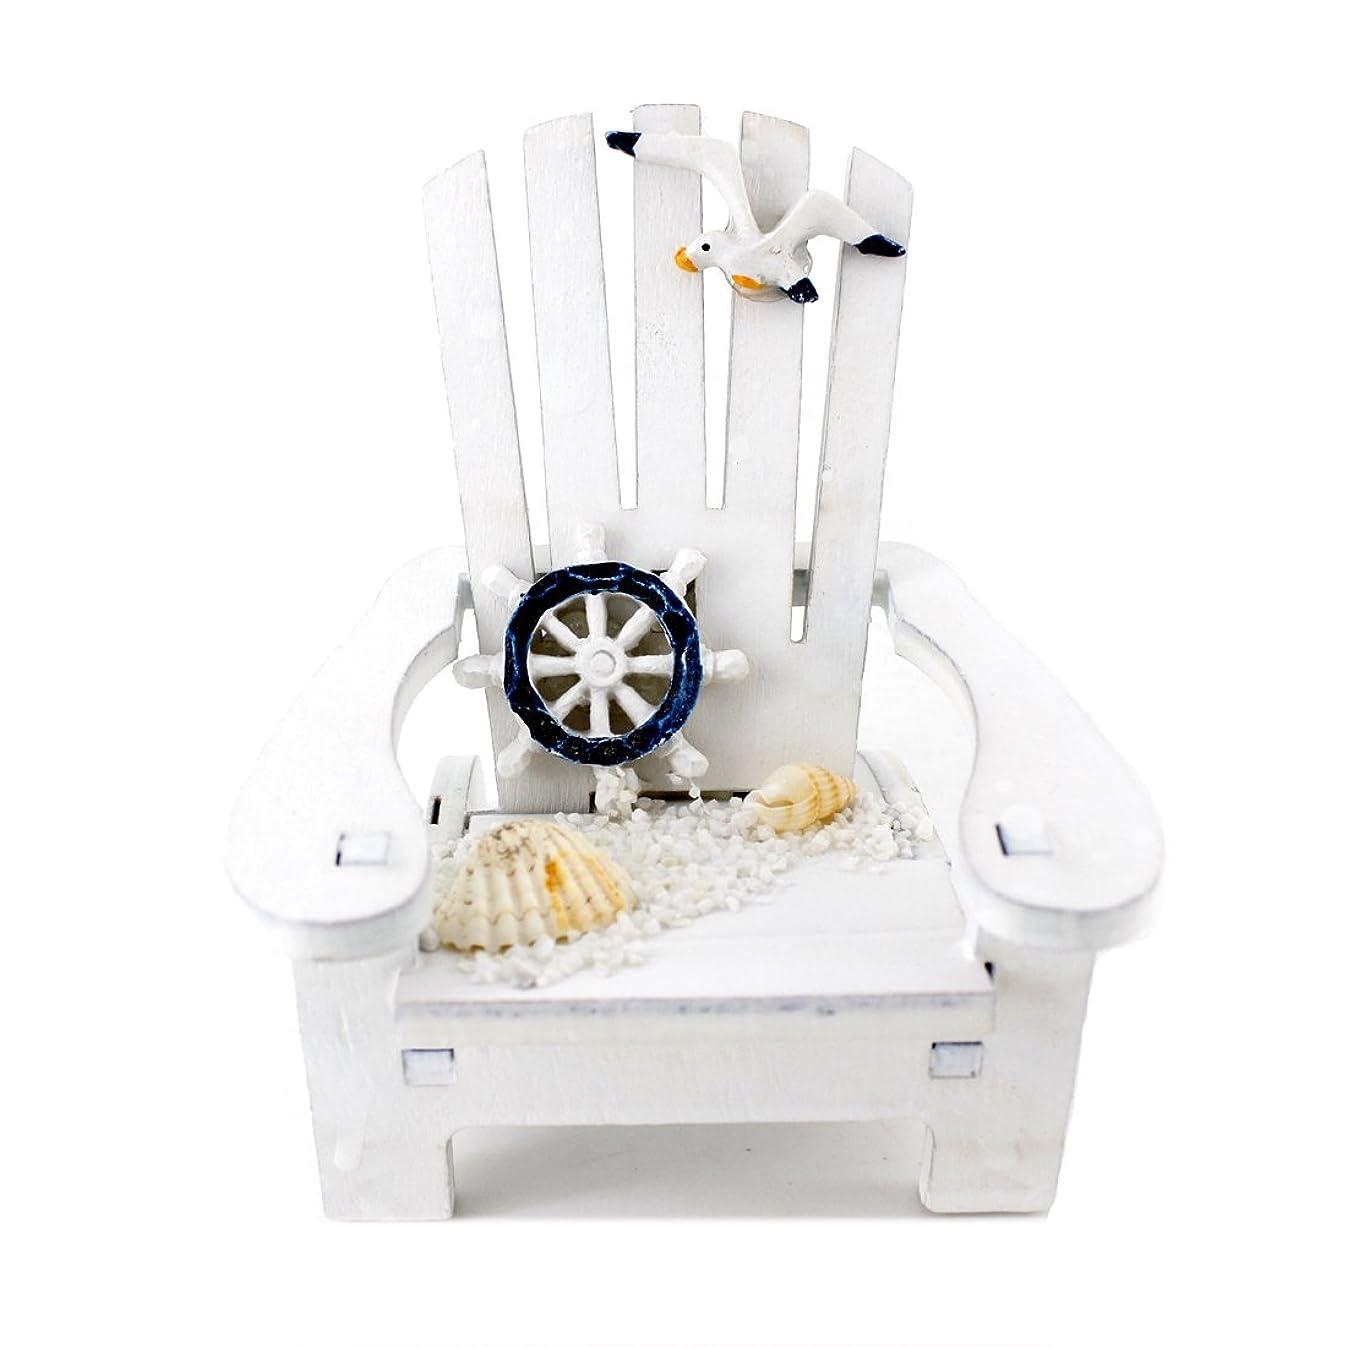 Handmade Cute White Rudder